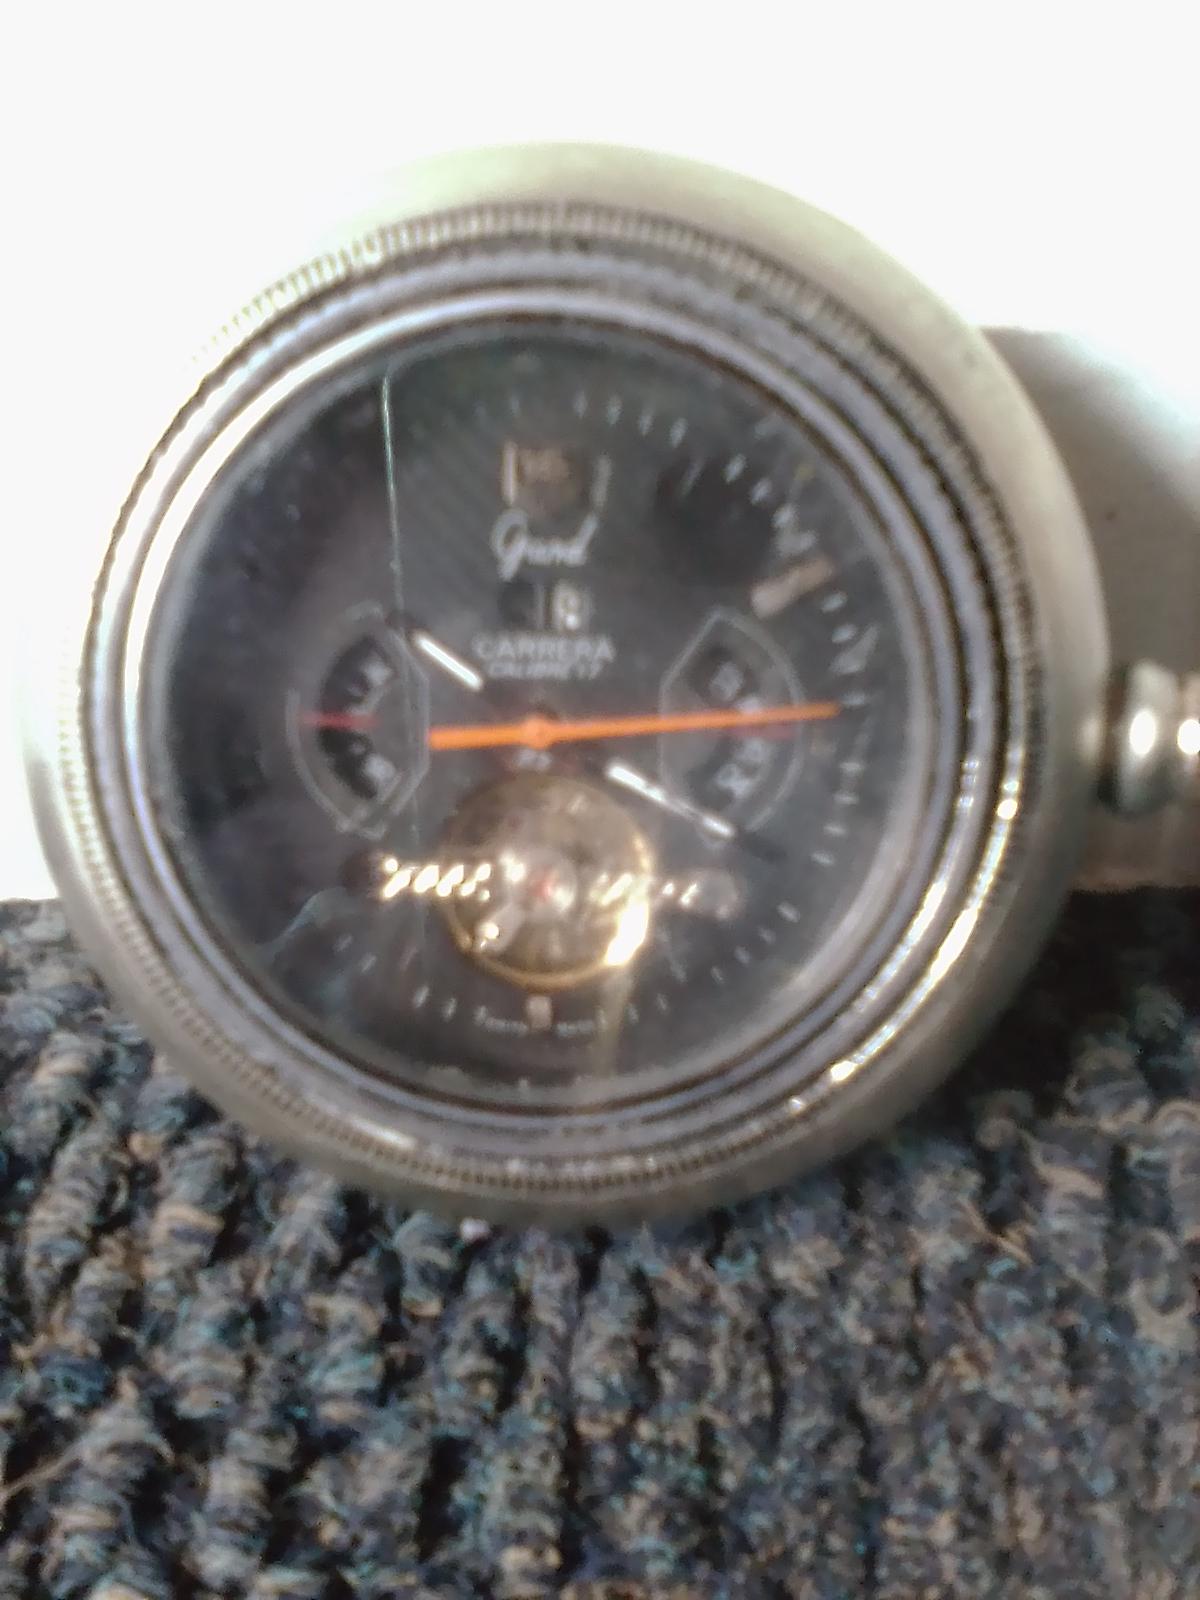 Tag Heuer Grand Carrera Calibre 17 silver pocket watch